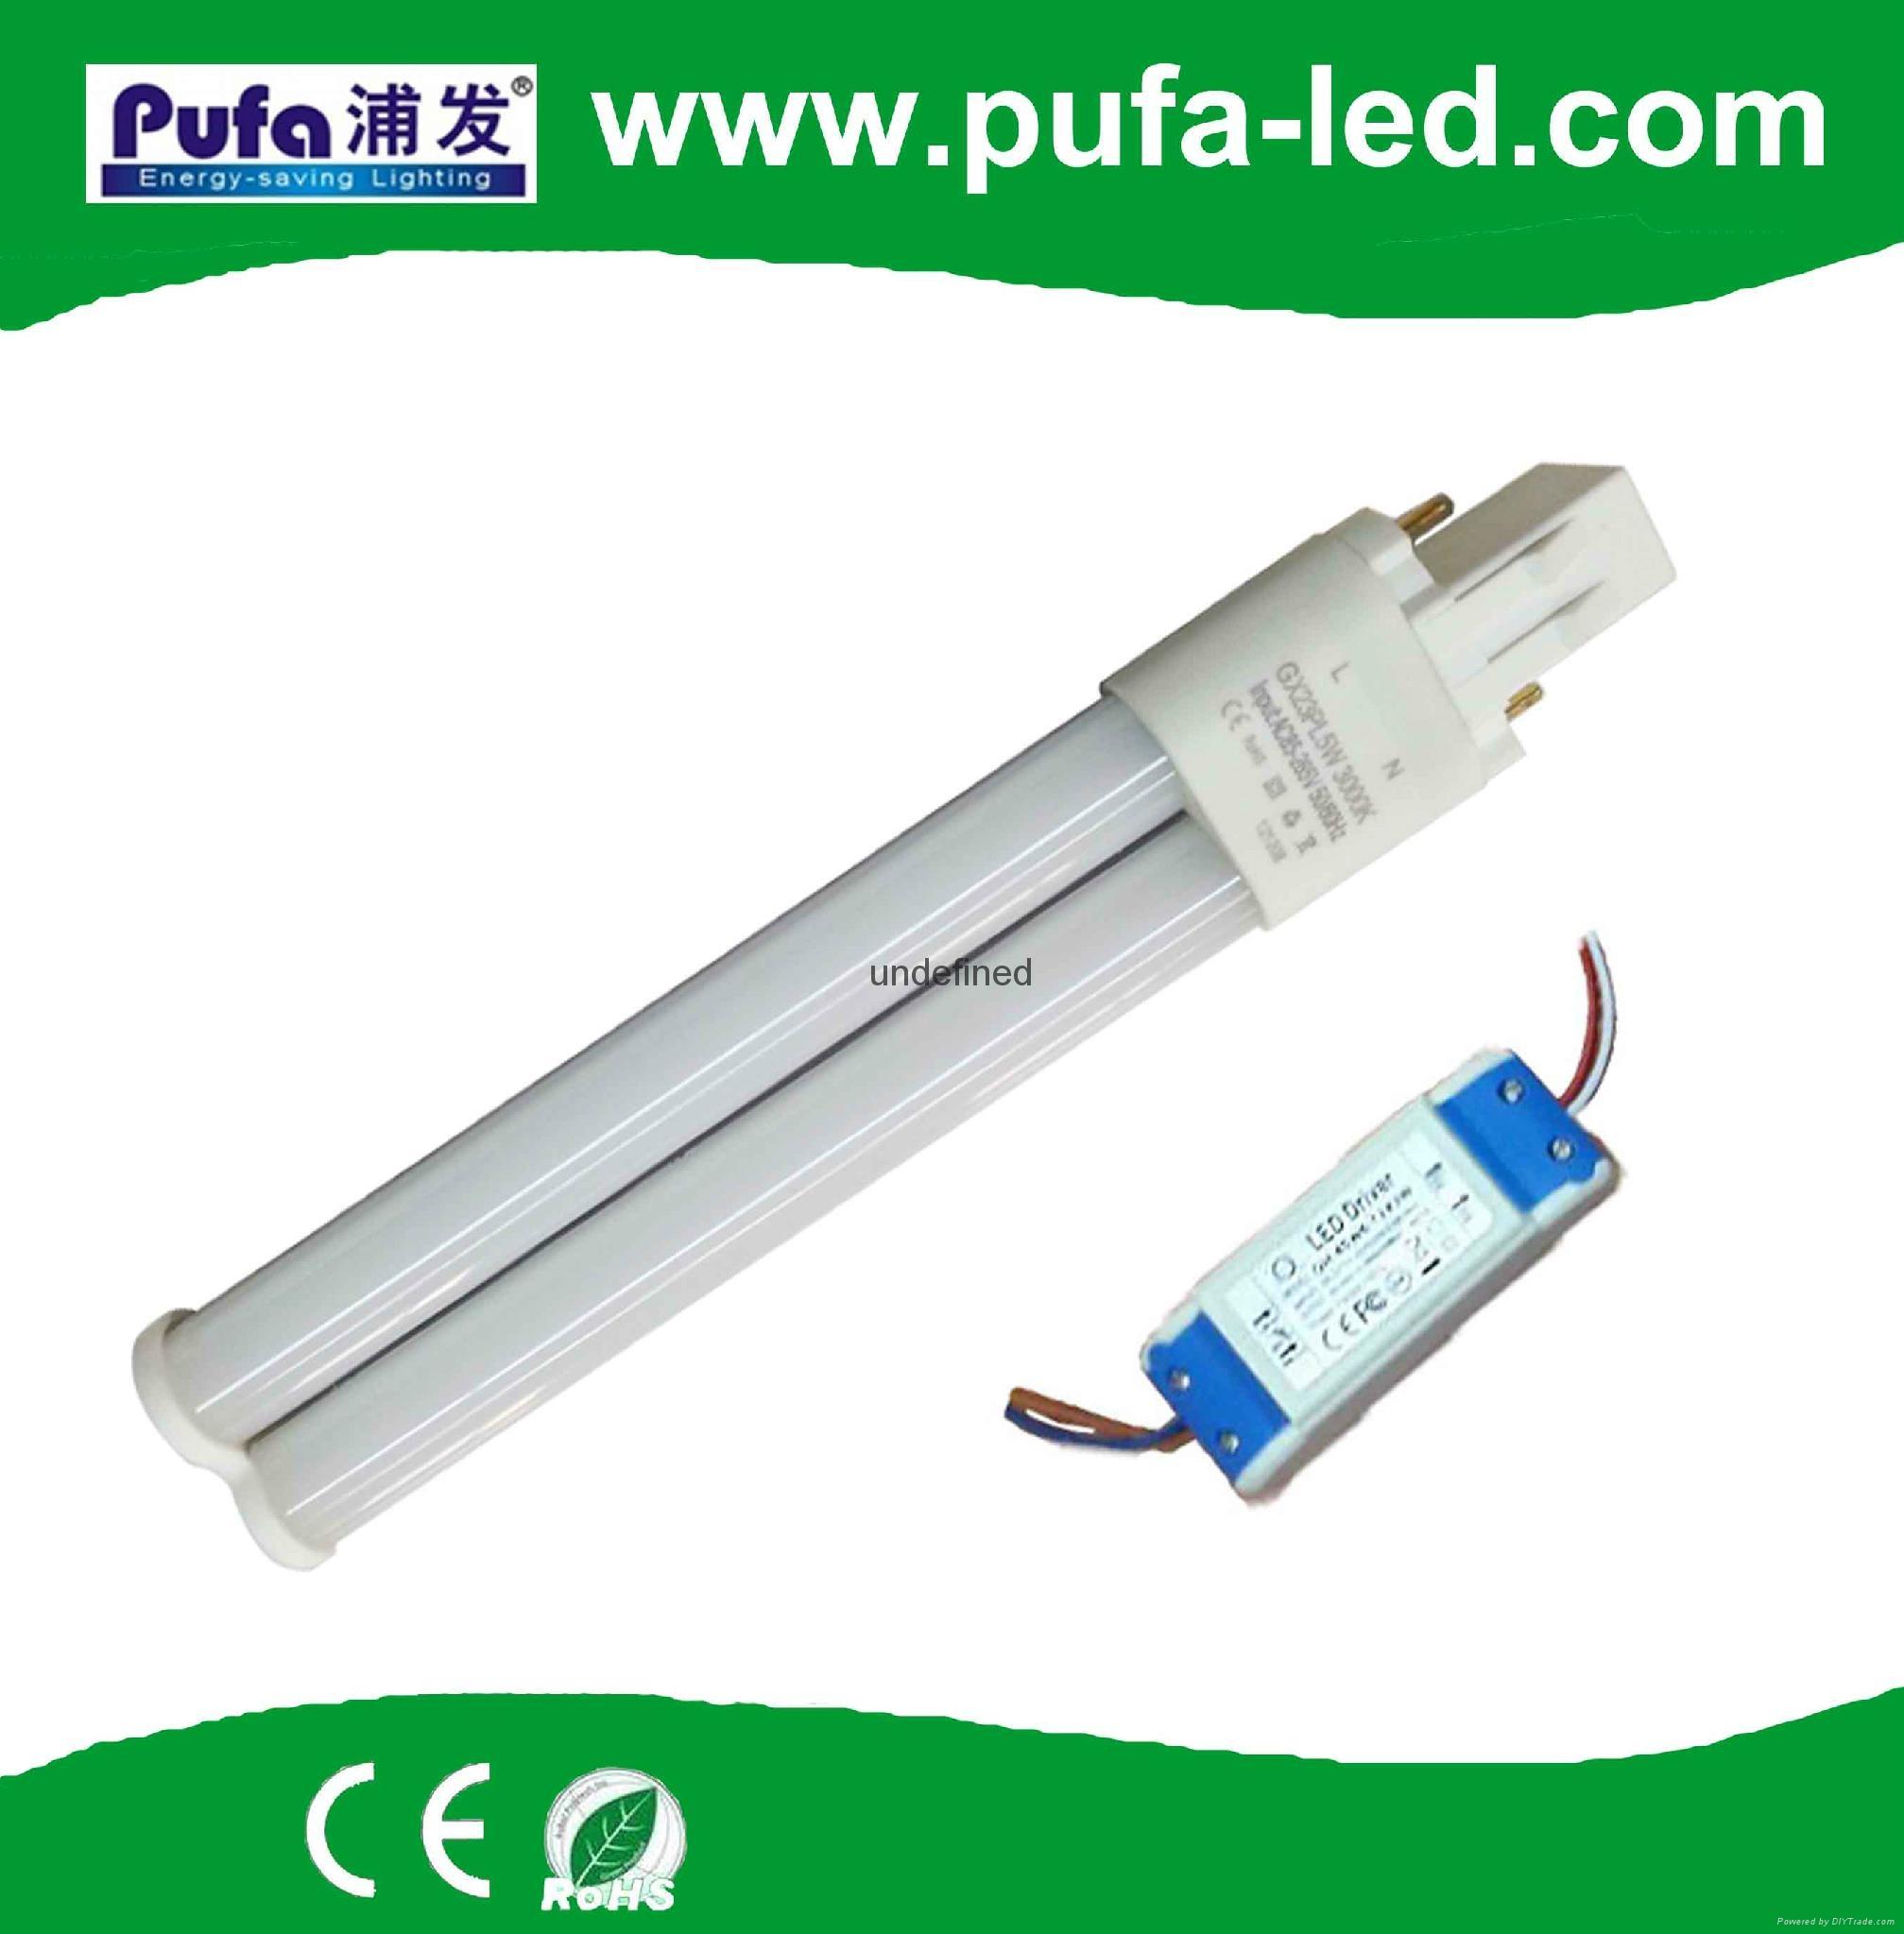 LED PLS Lamp GX23 12W external driver 1